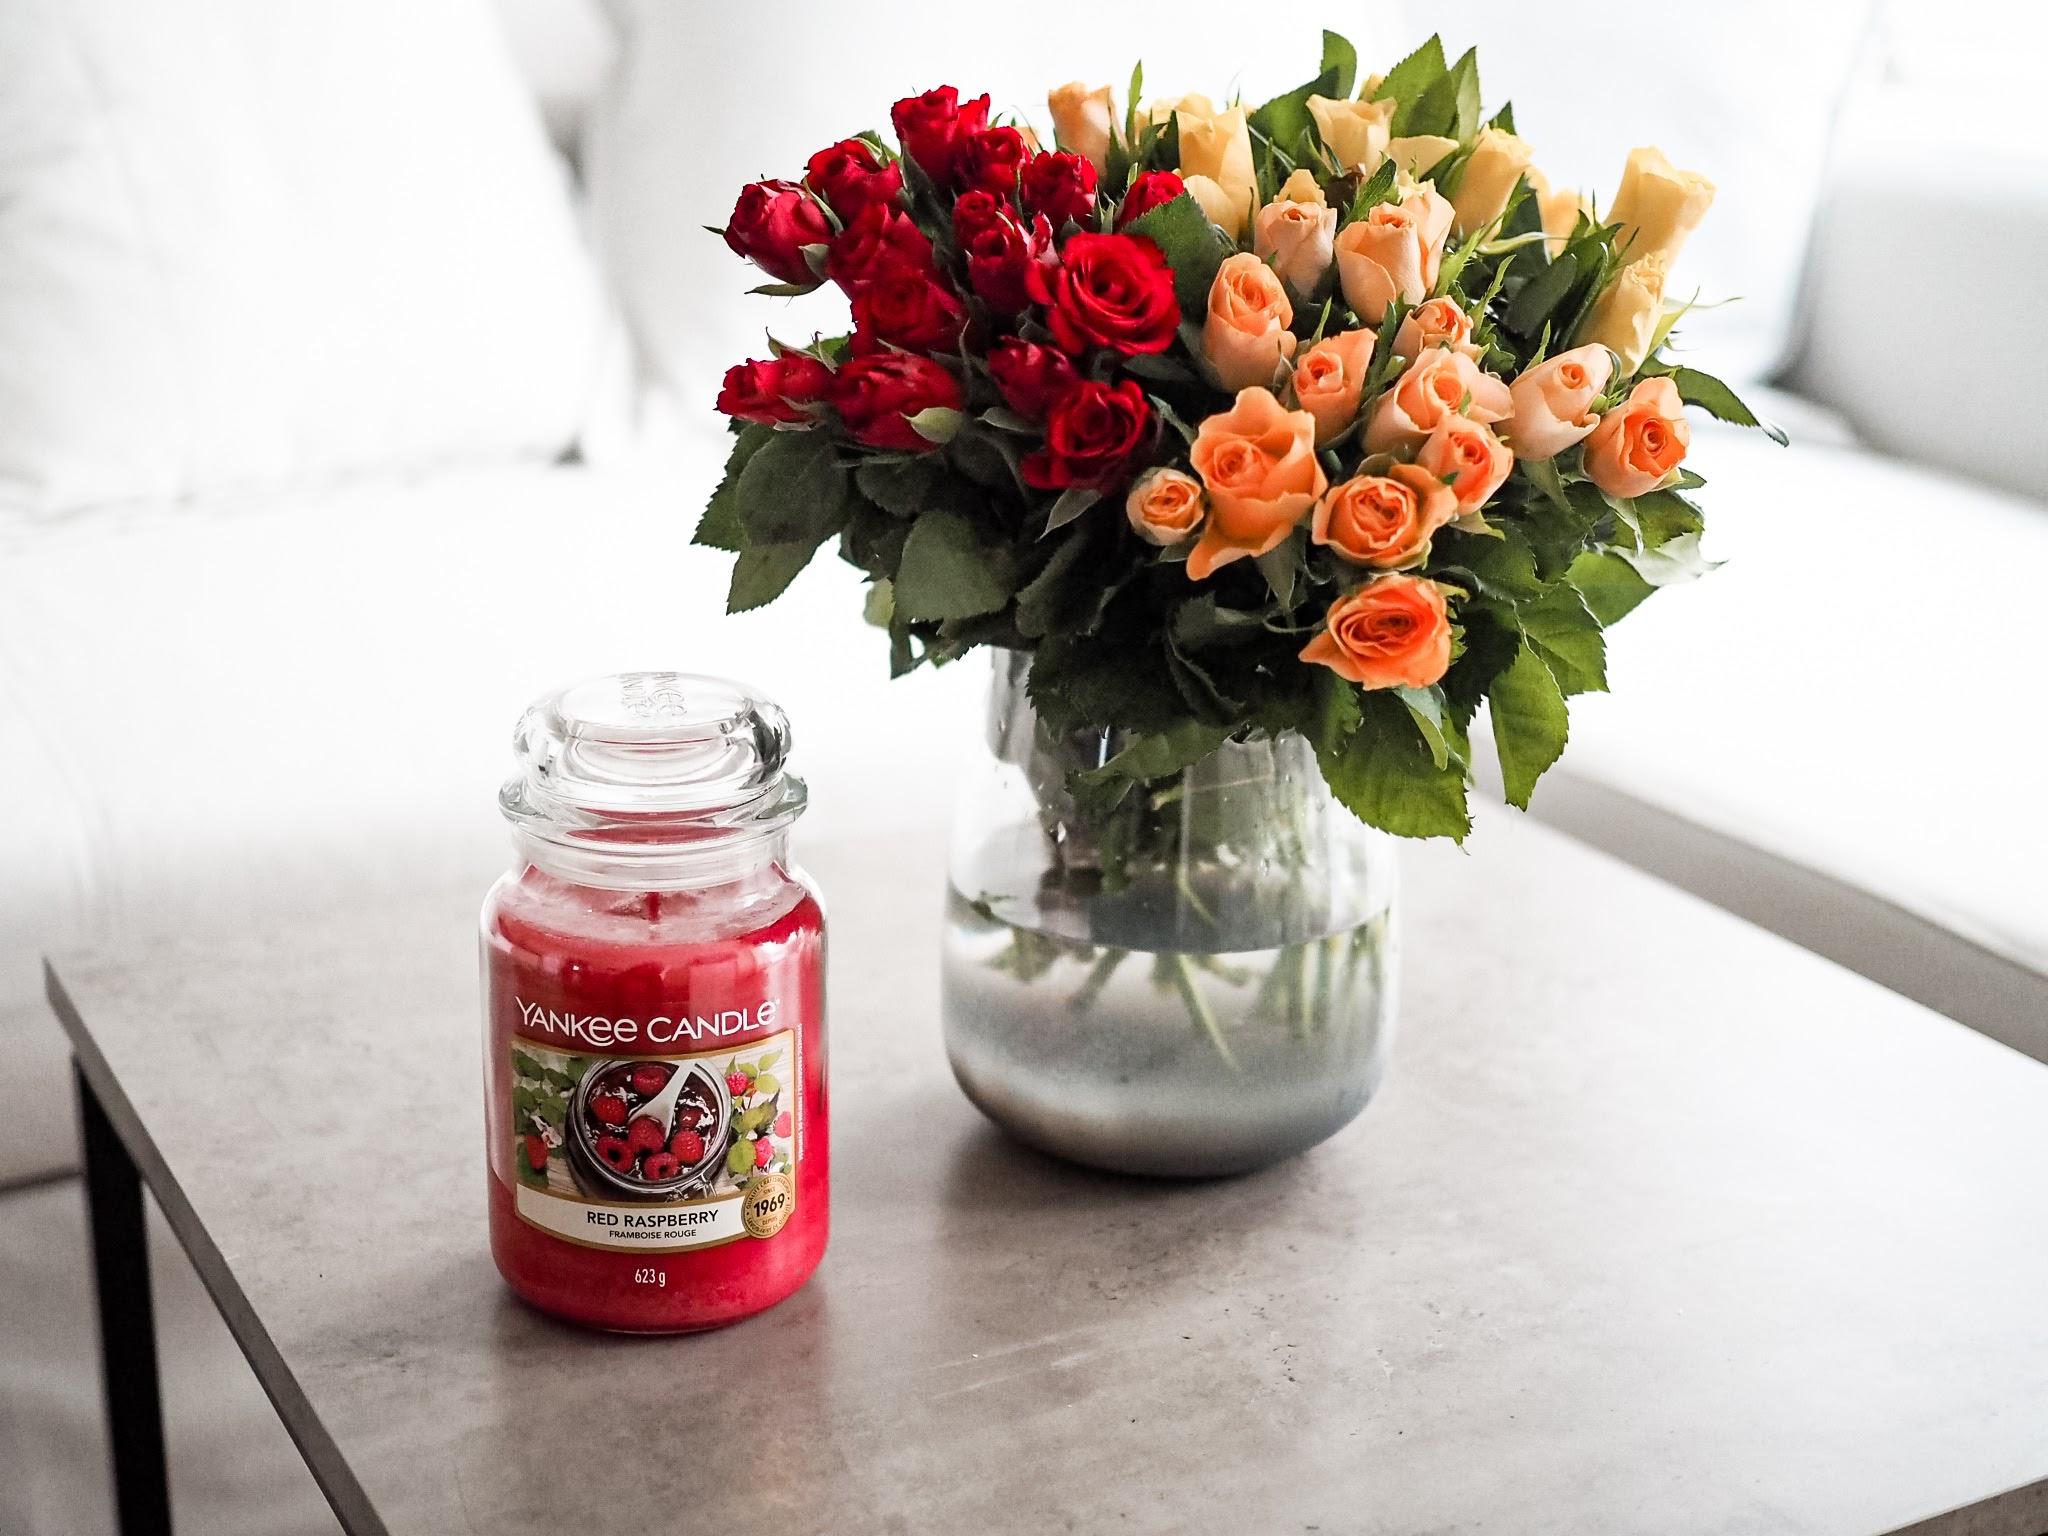 Yankee candle red raspberry